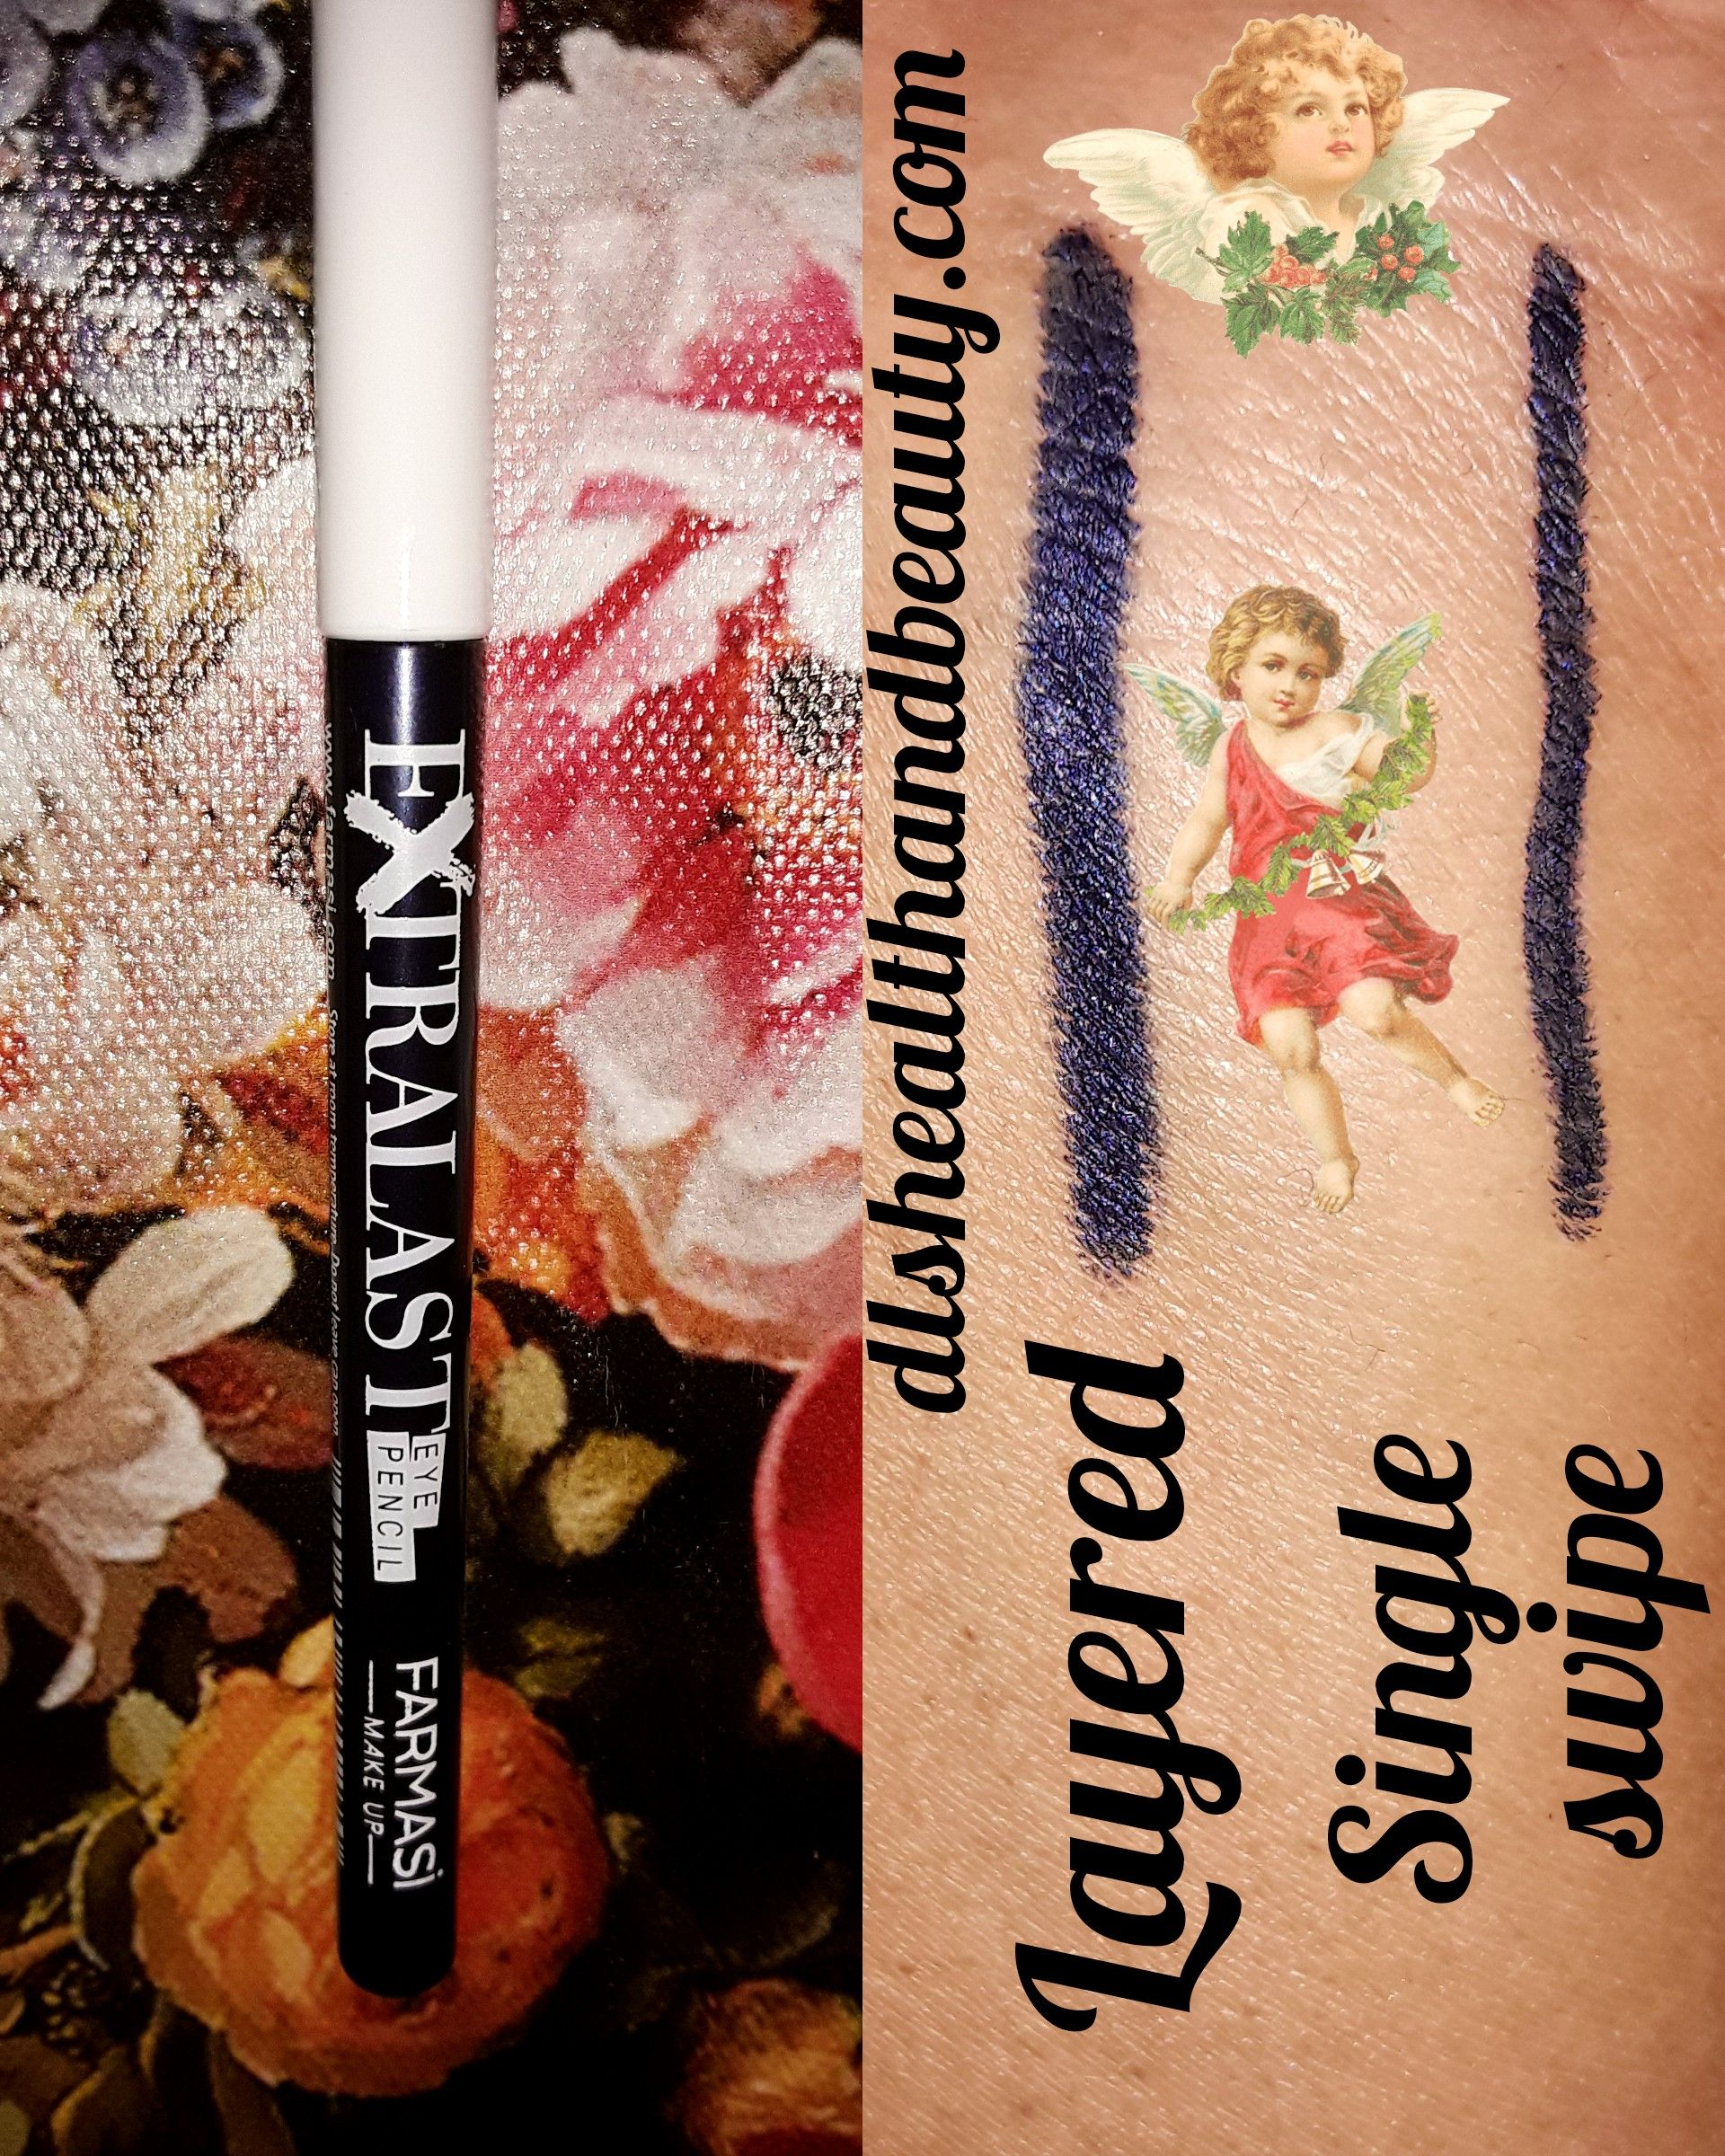 CrueltyFree Cosmetic Product Review Kalemi Ürün Yorumu